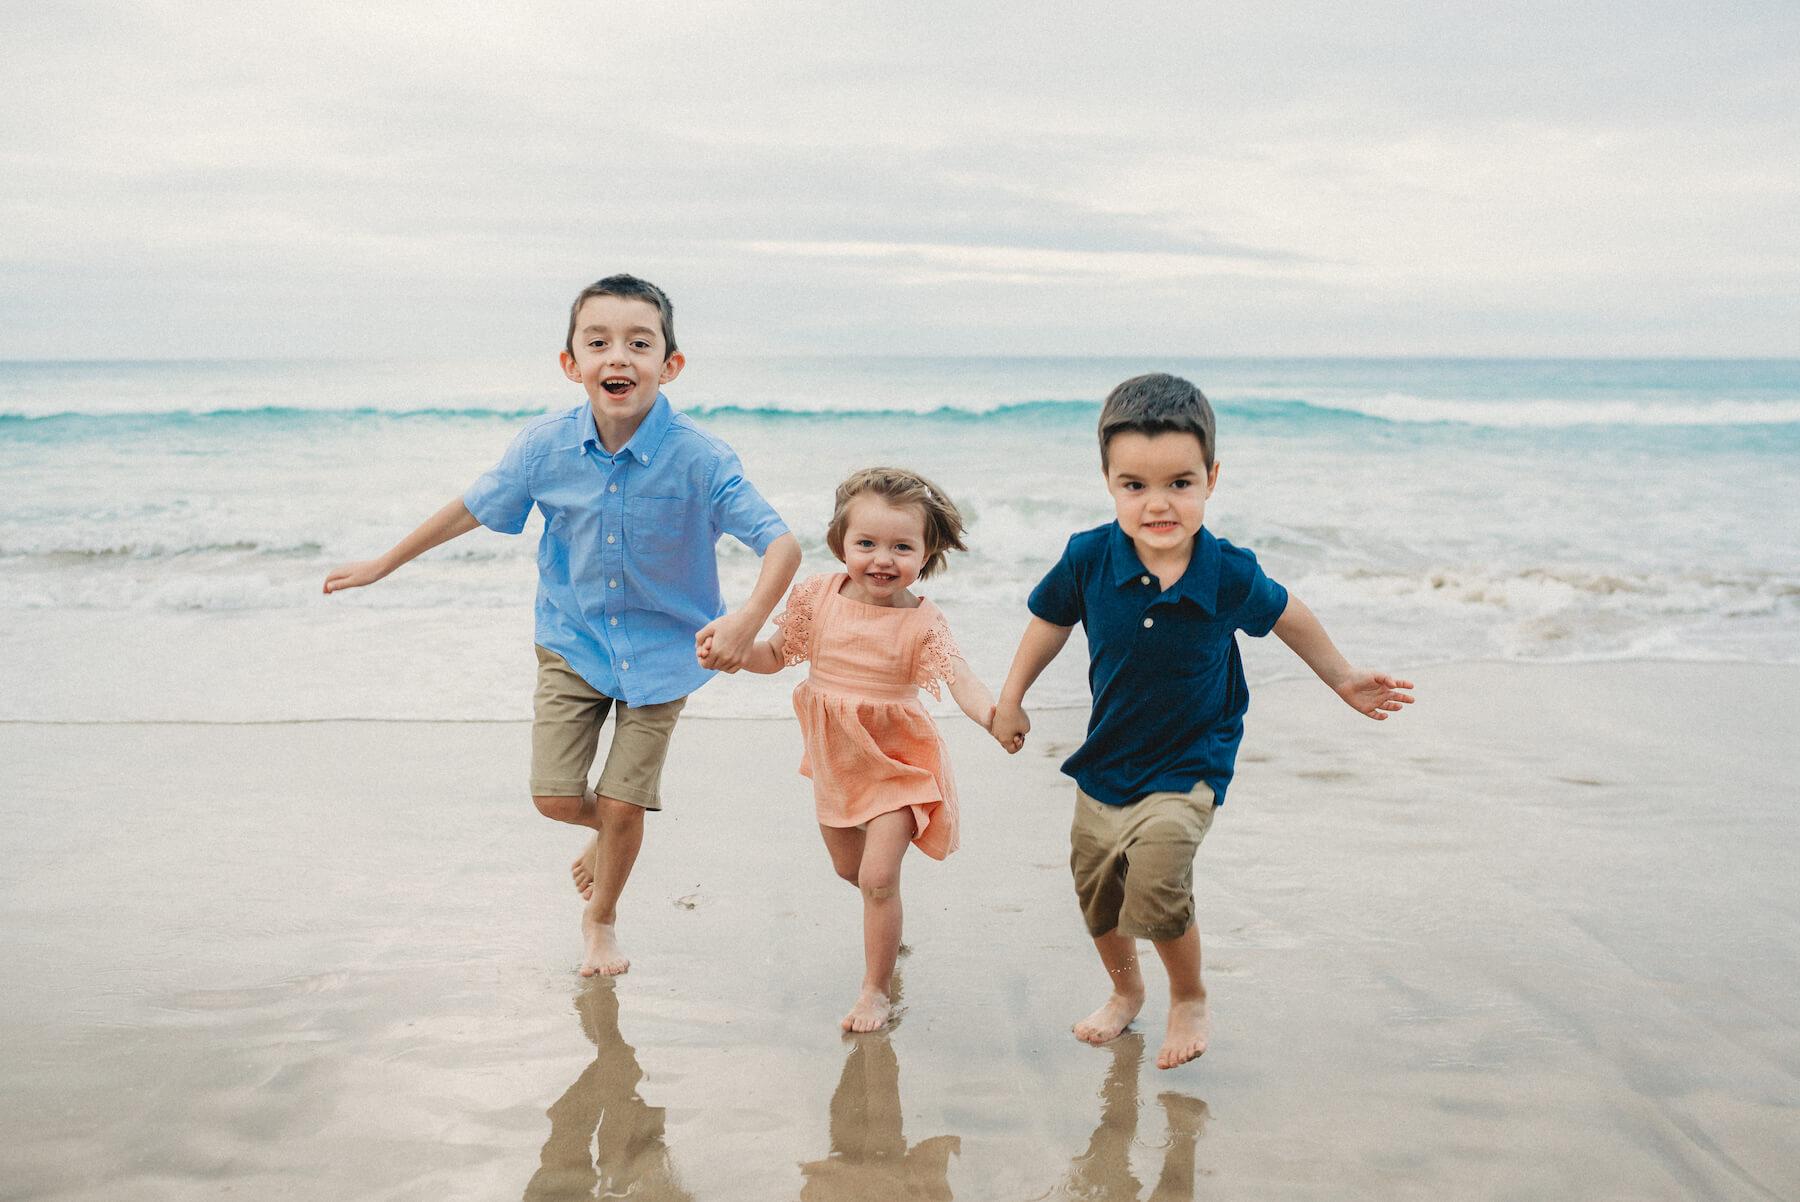 Kids running on the beach in Kona, Hawaii